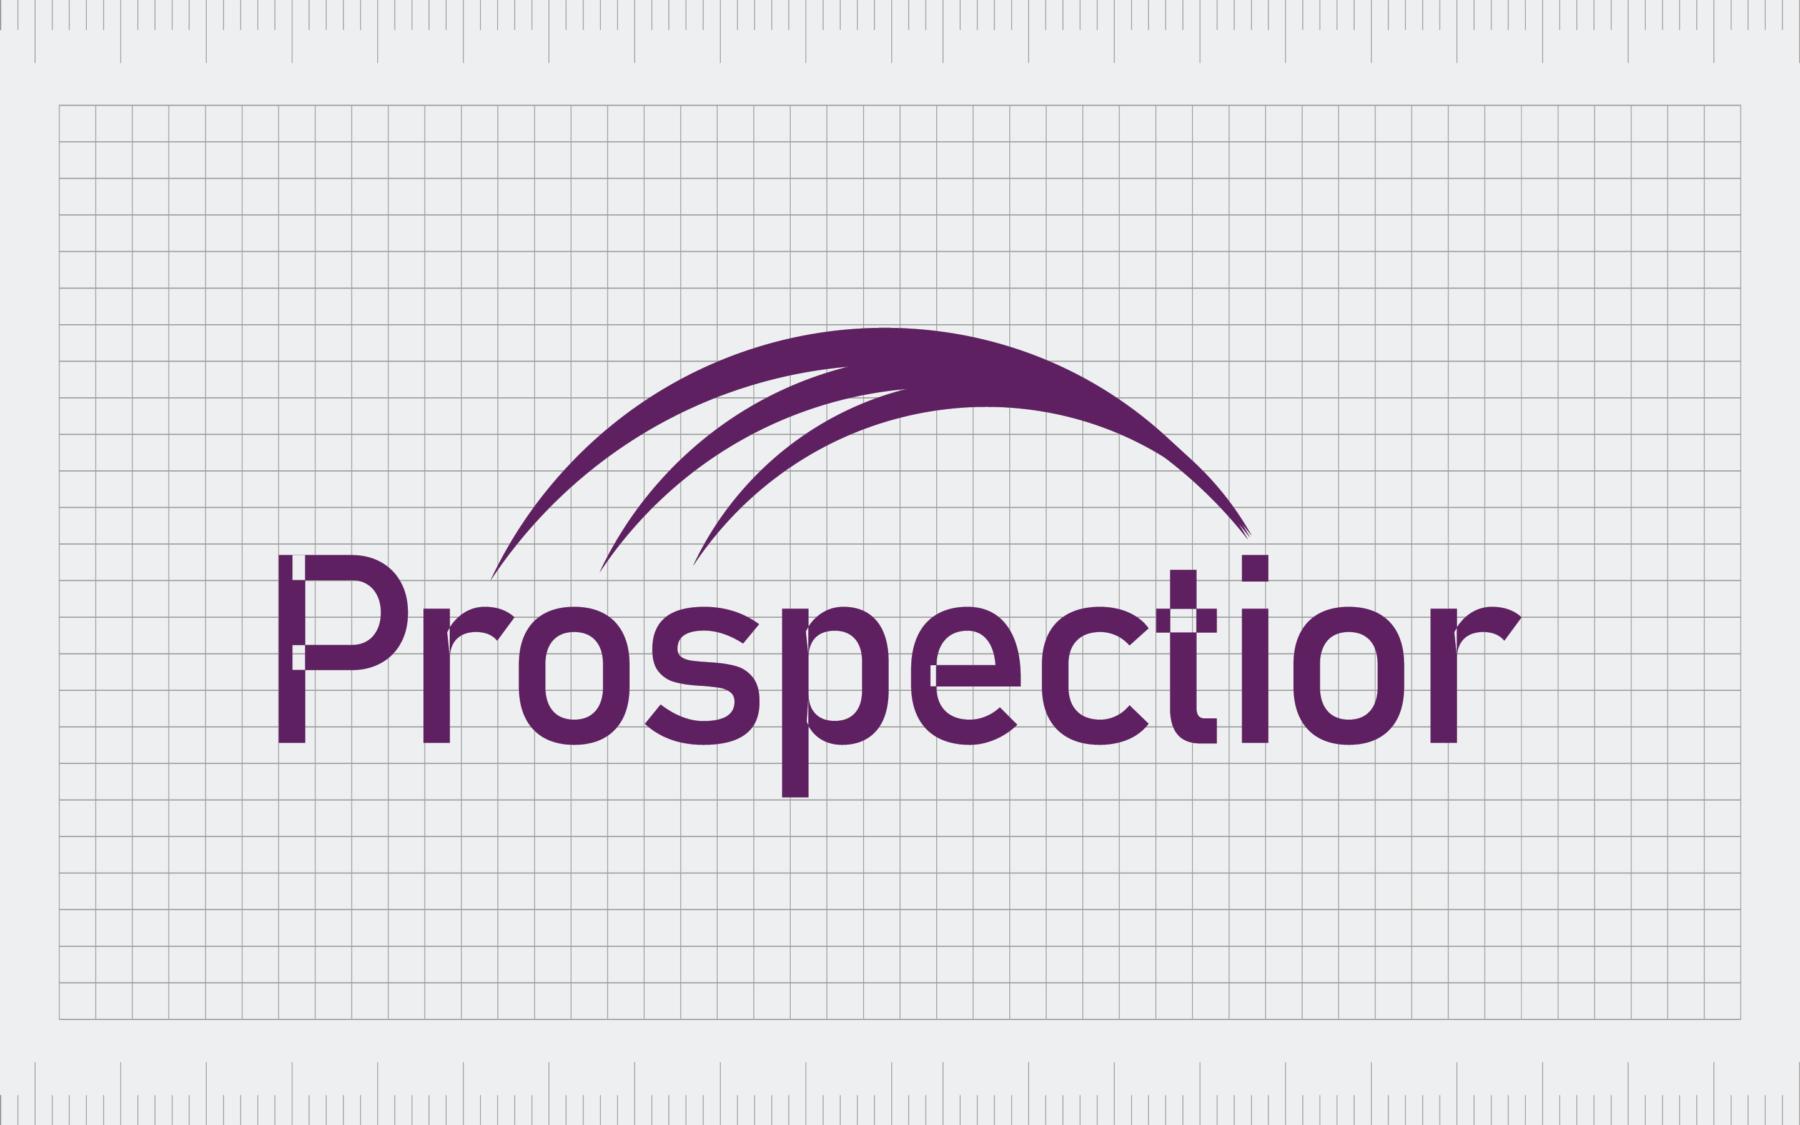 Prospectior